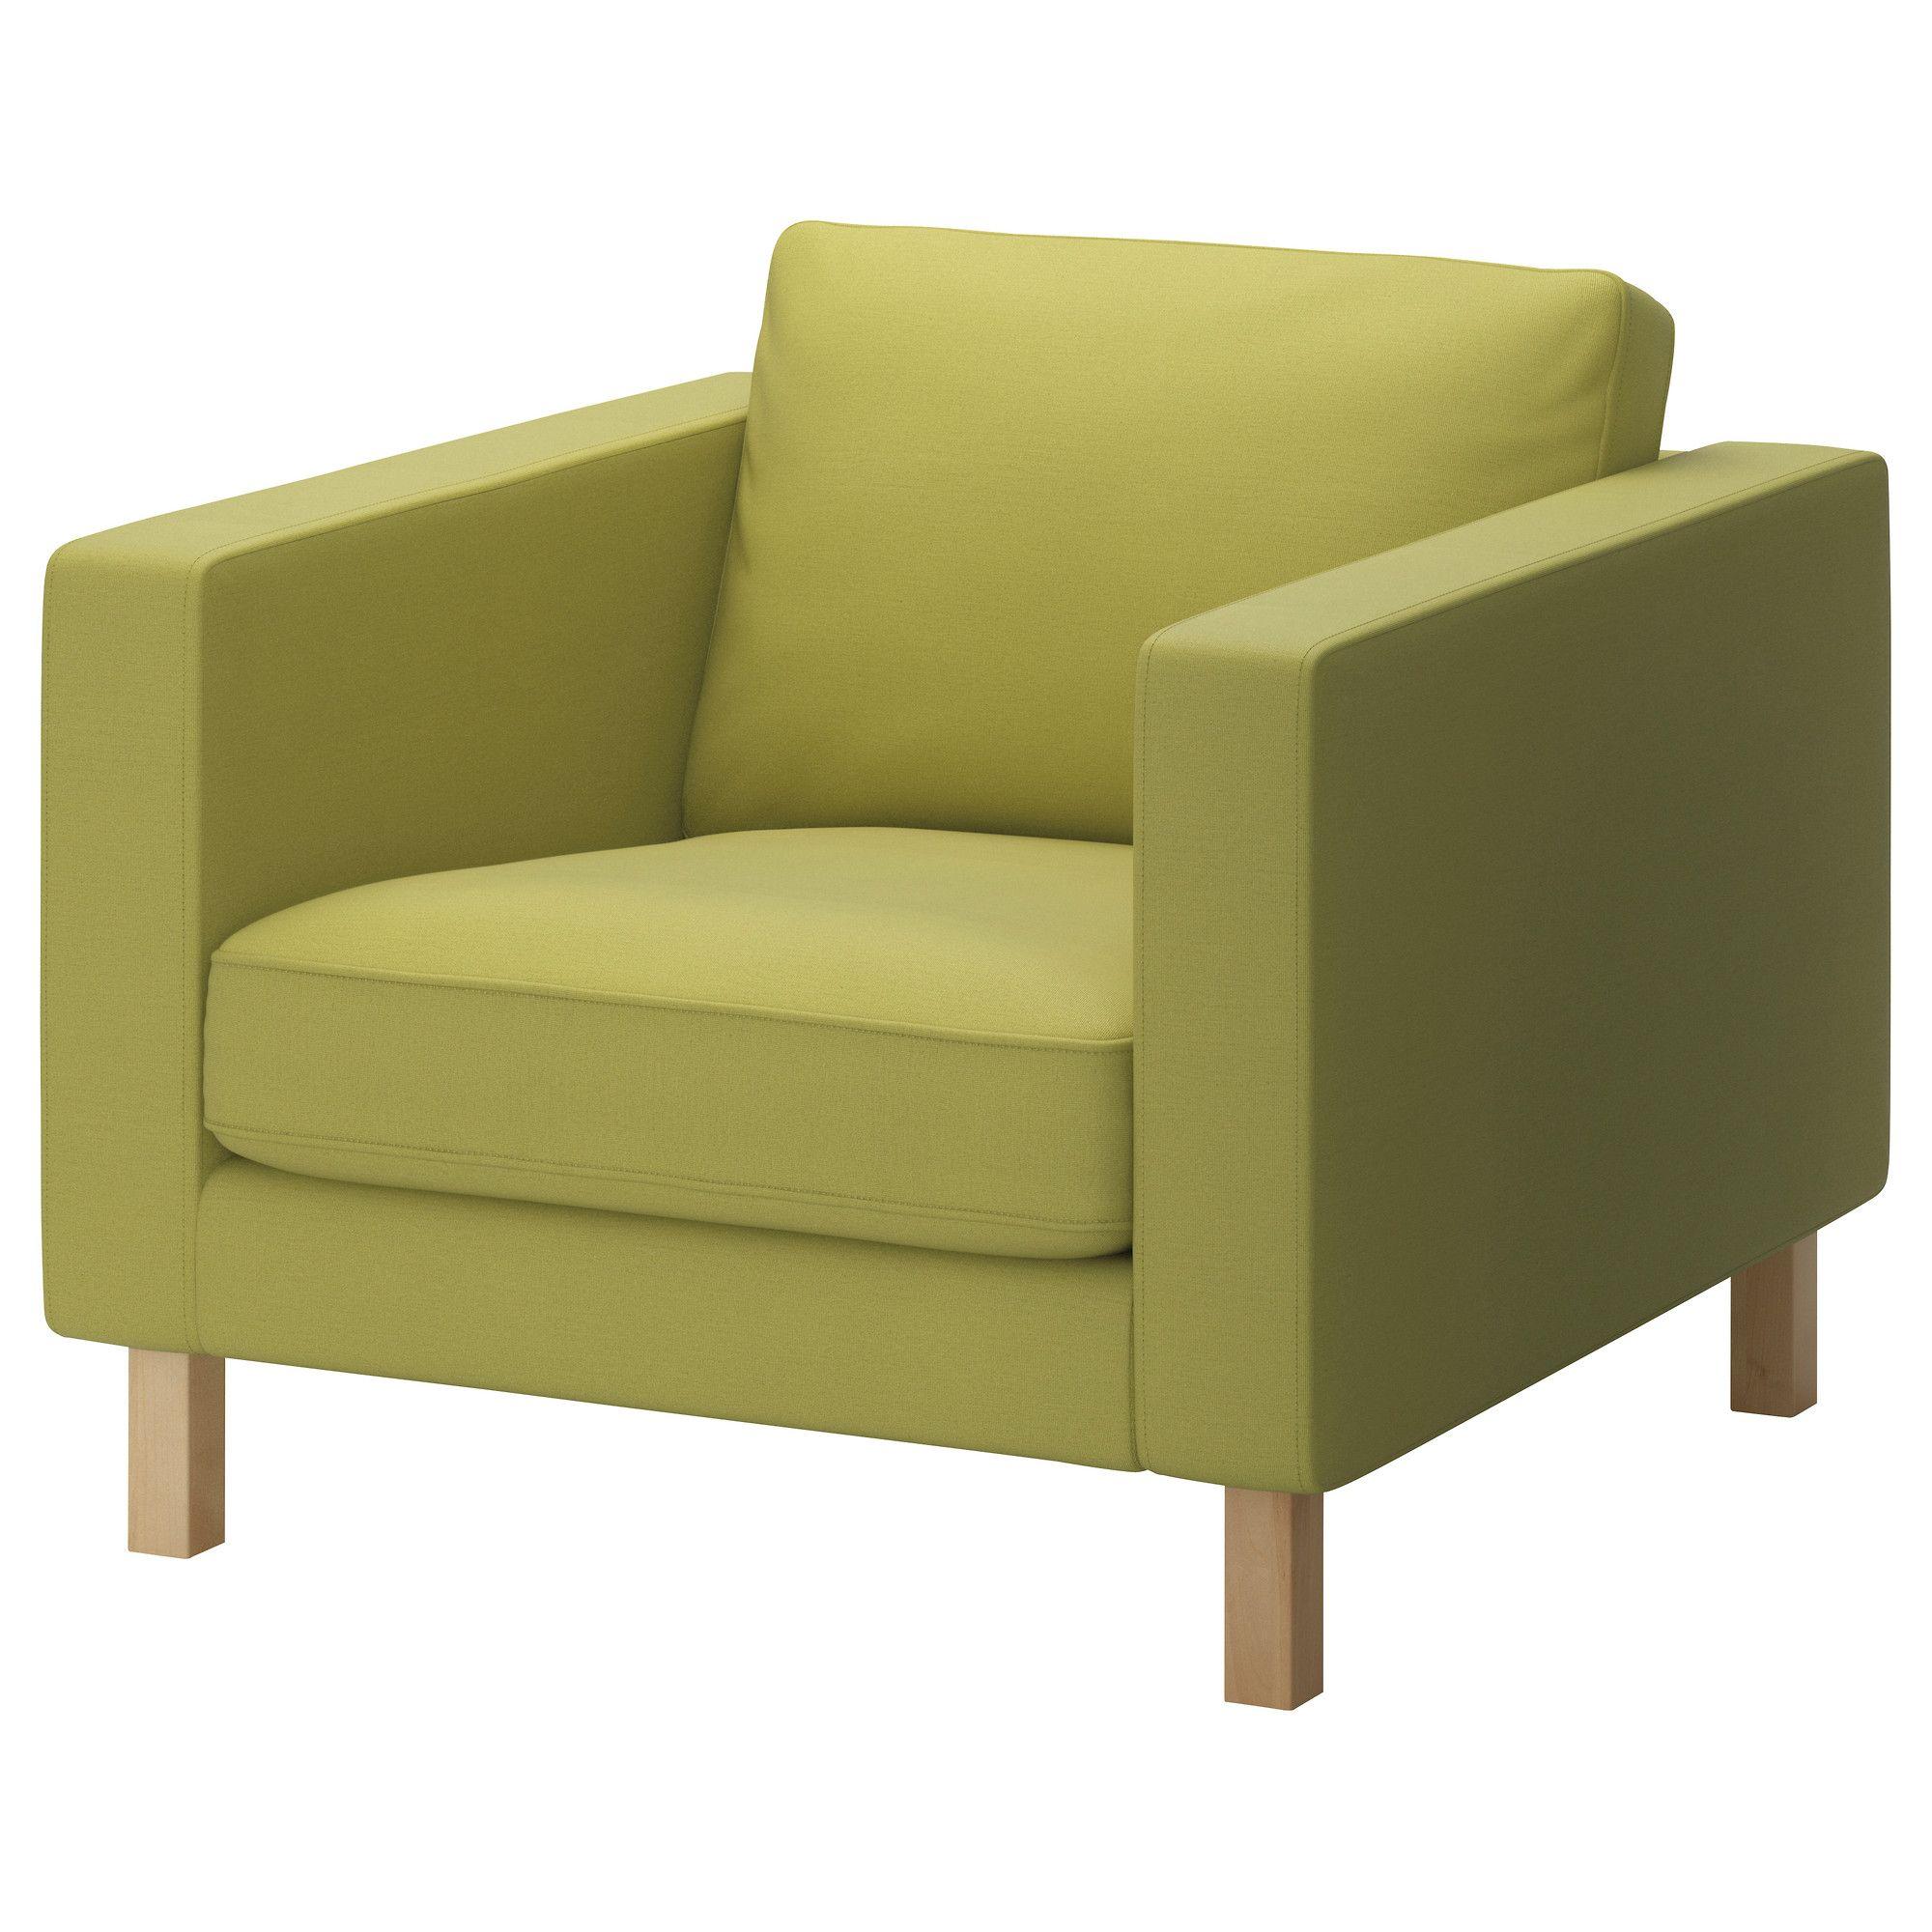 KARLSTAD Sessel - Sivik gelbgrün - IKEA